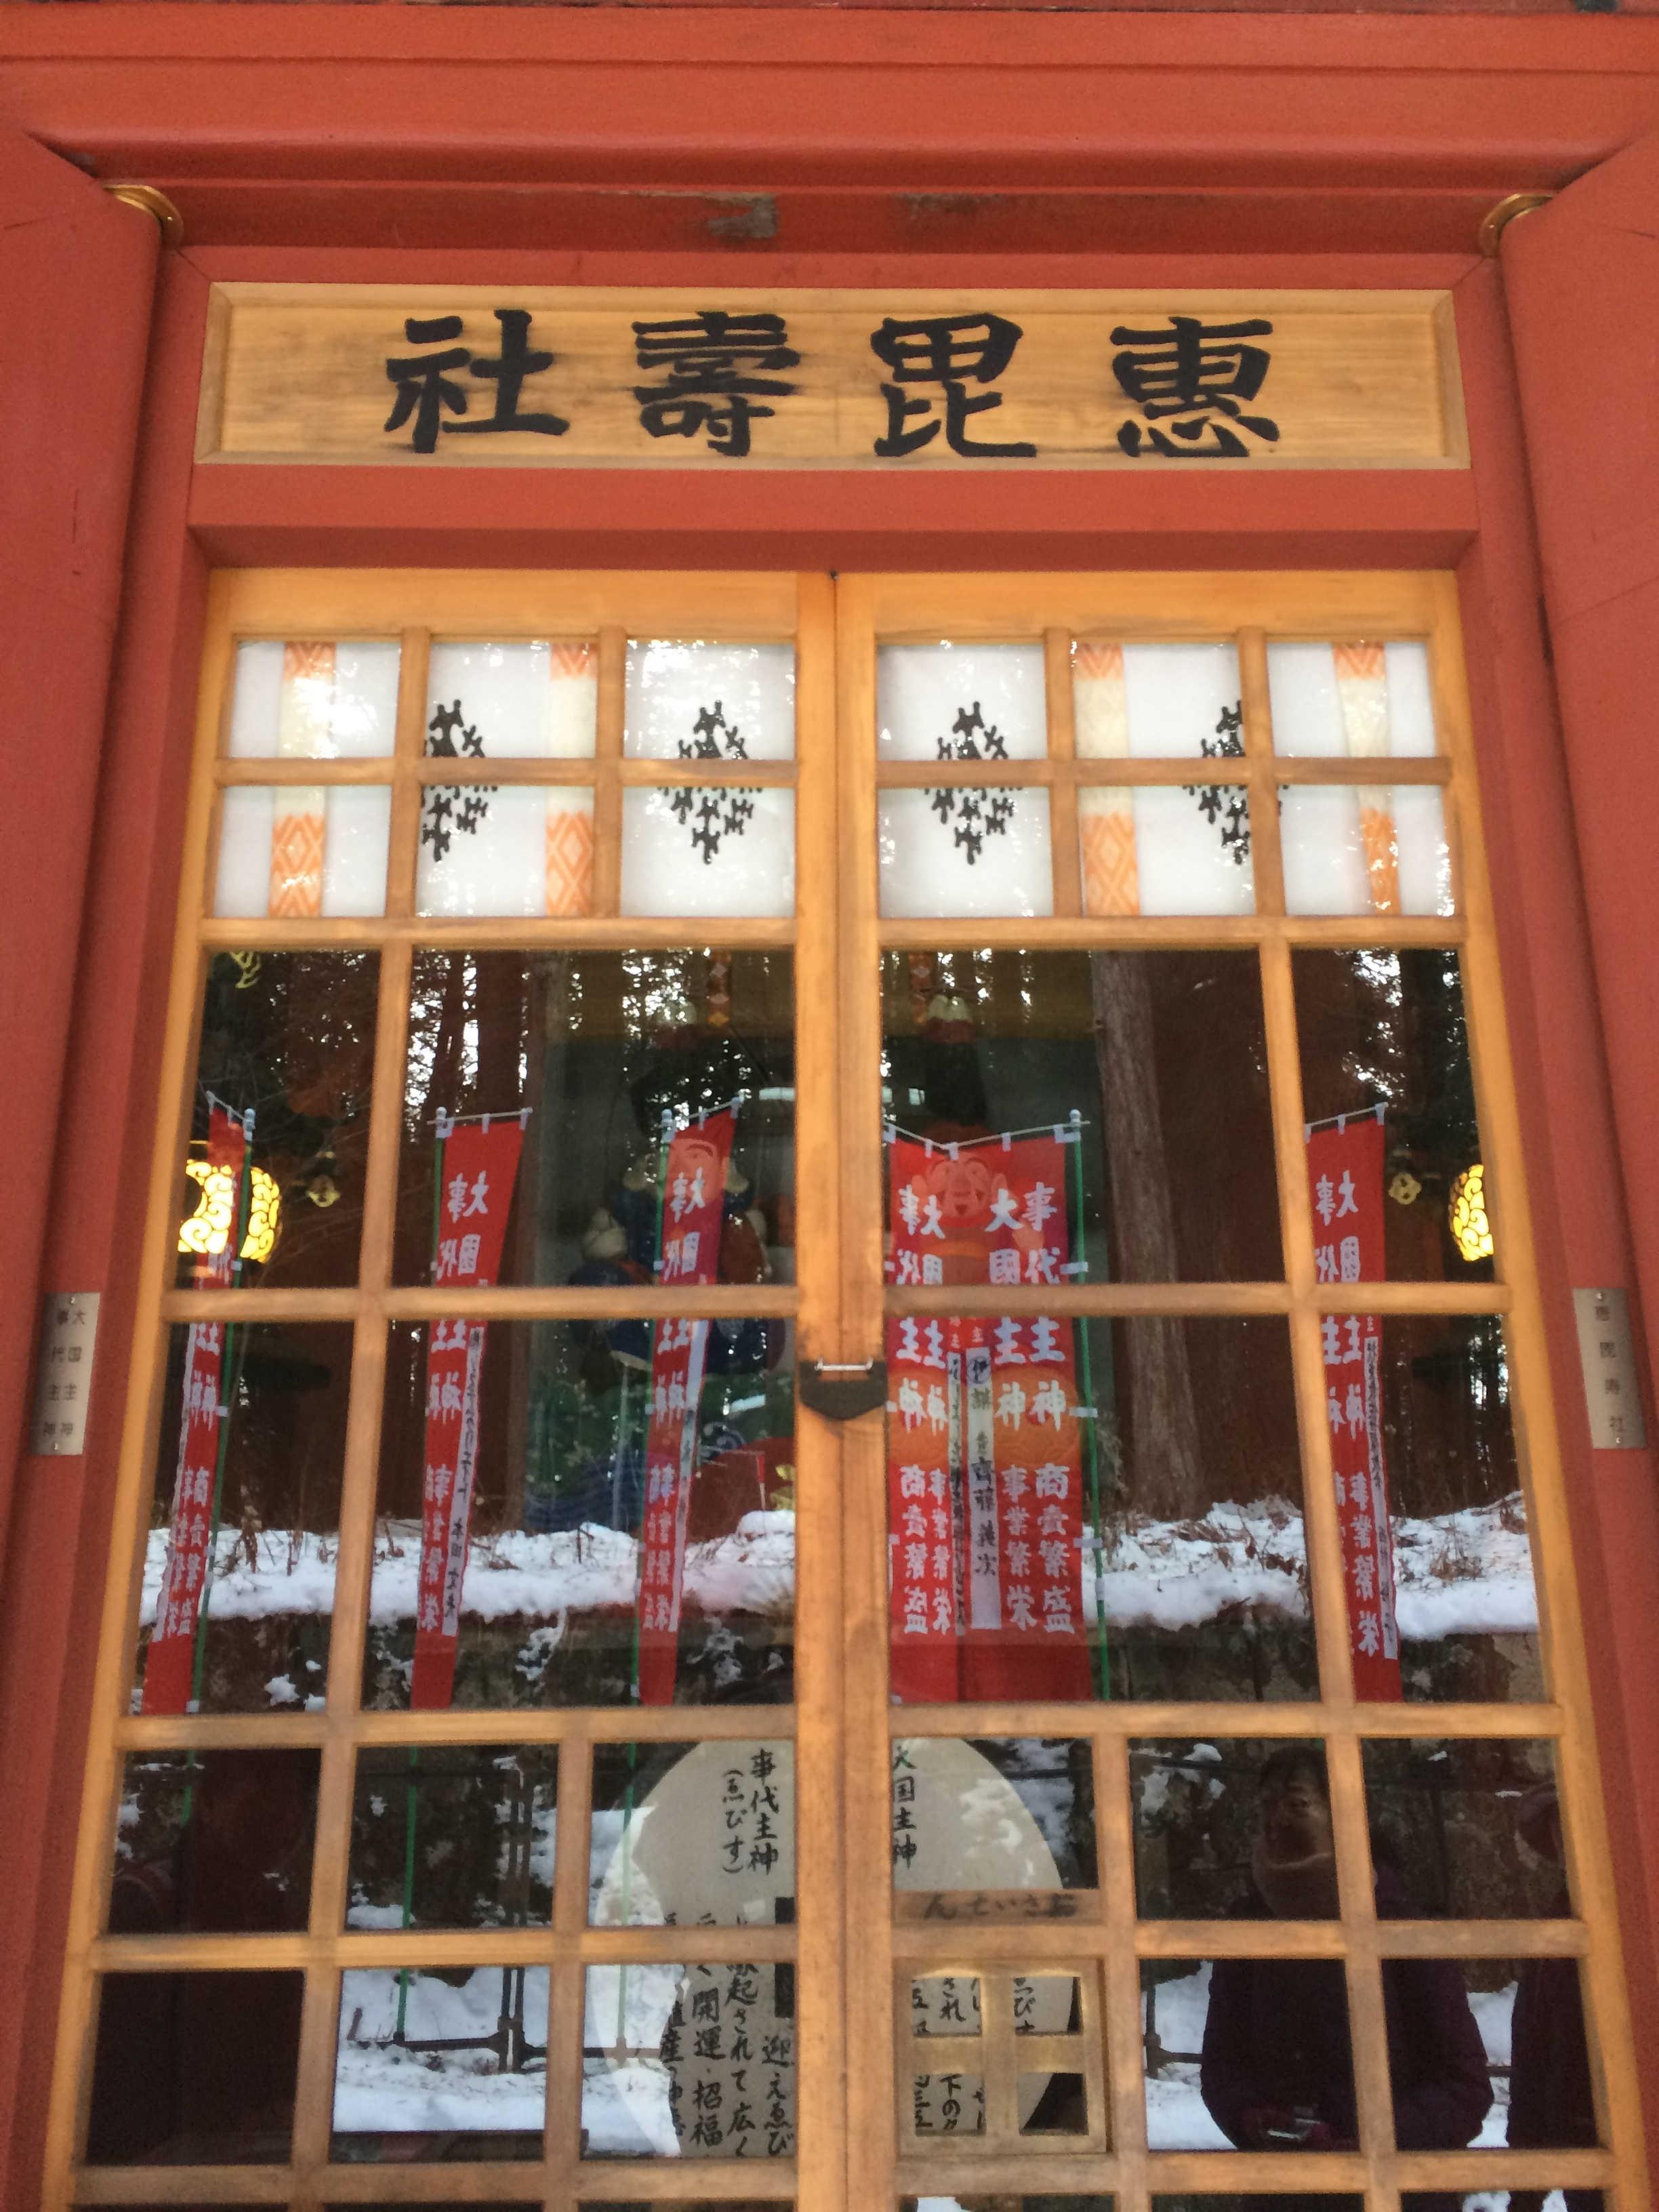 本殿裏の恵比寿社